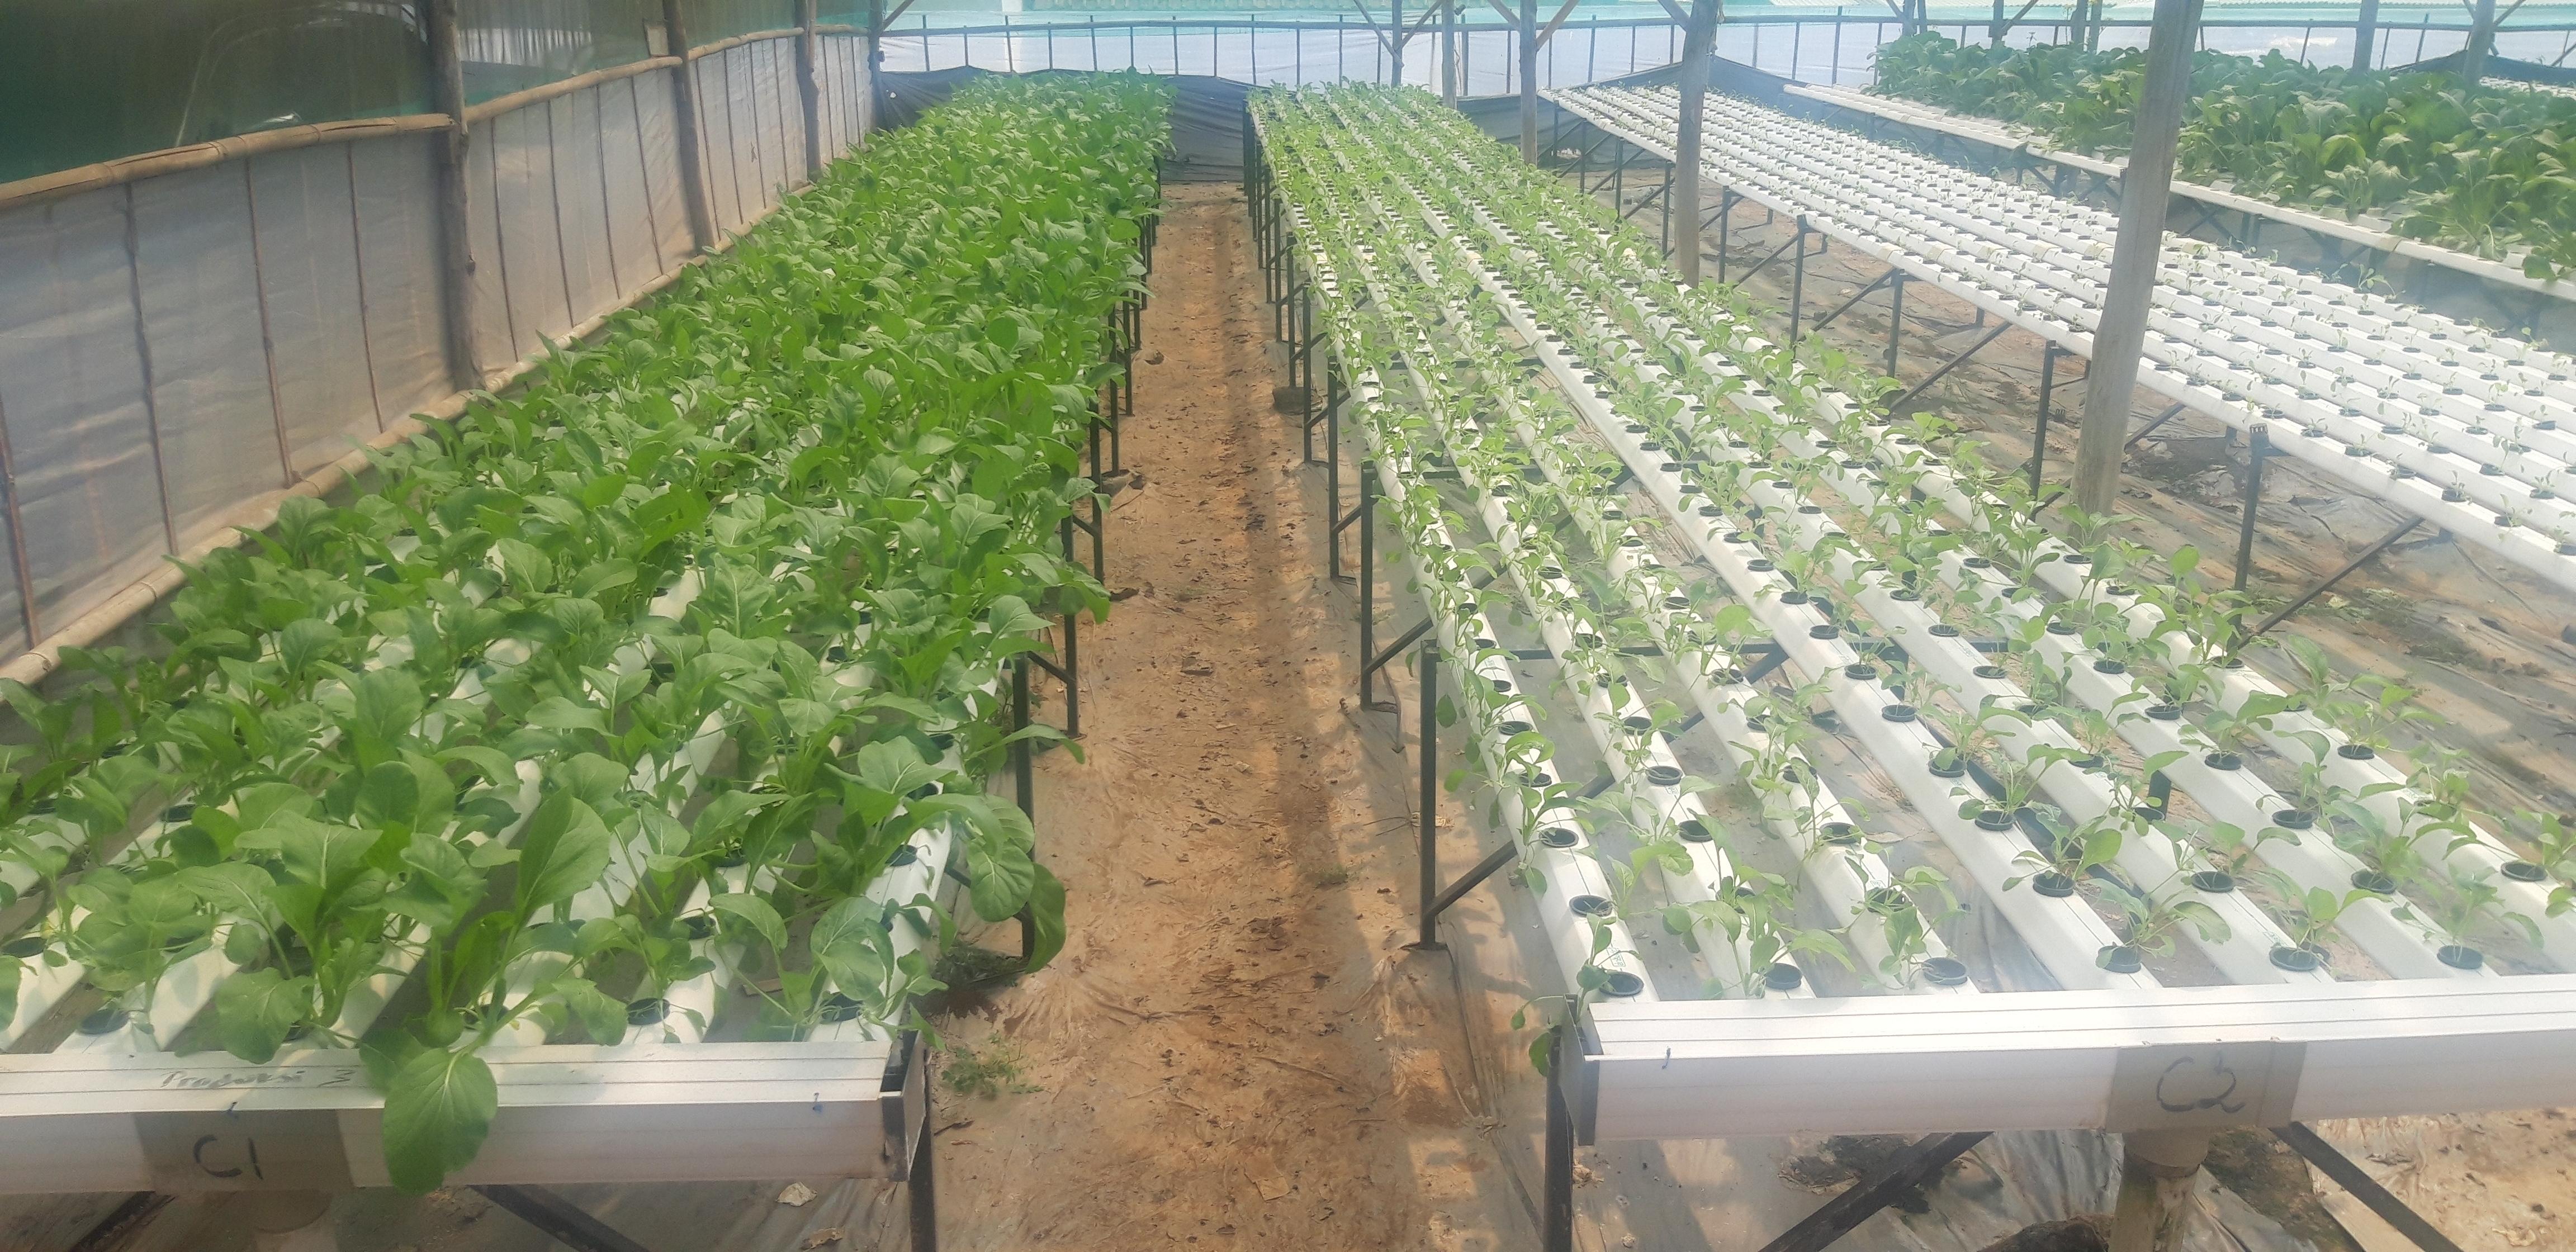 CV. Berastagi Farm